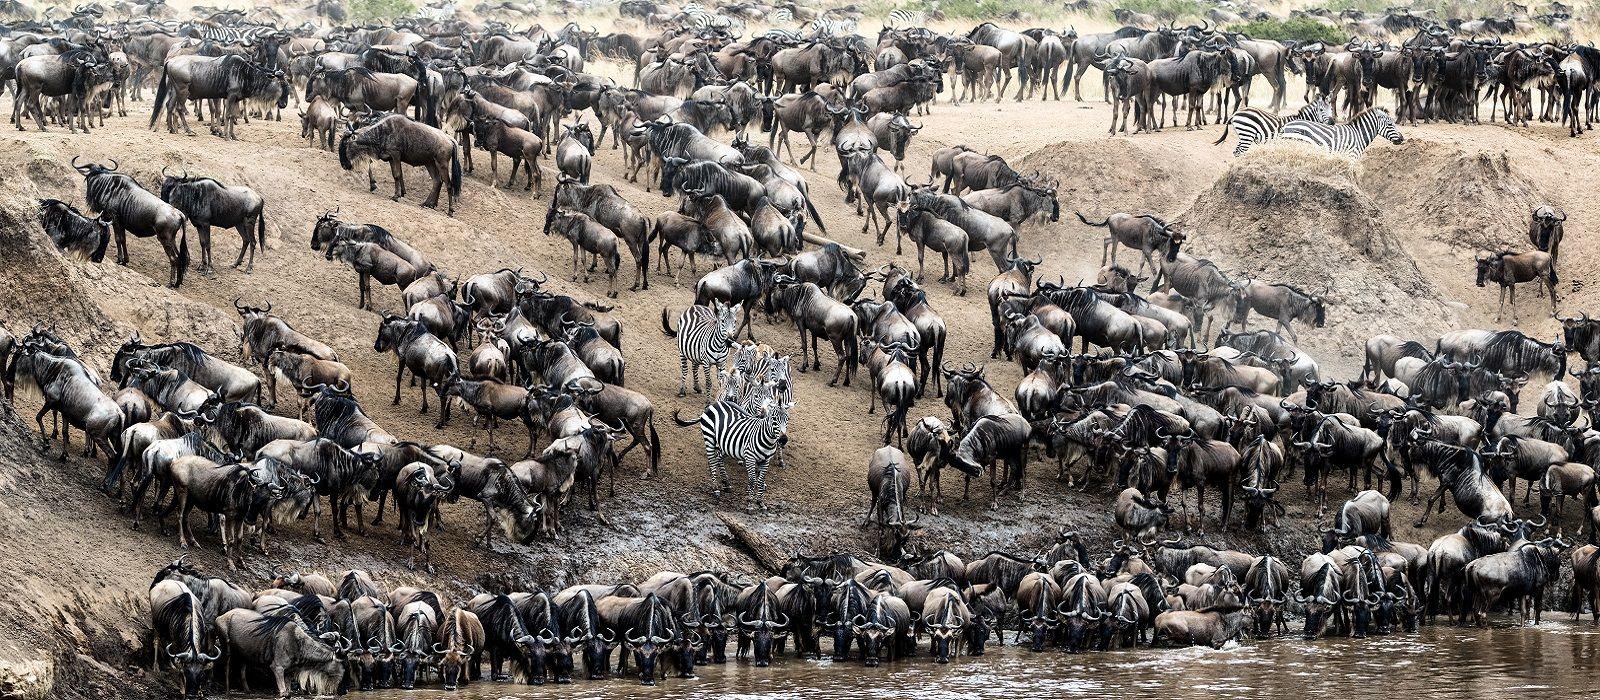 Atua Enkop Exklusiv: Kenia Safari und Strandurlaub Urlaub 3